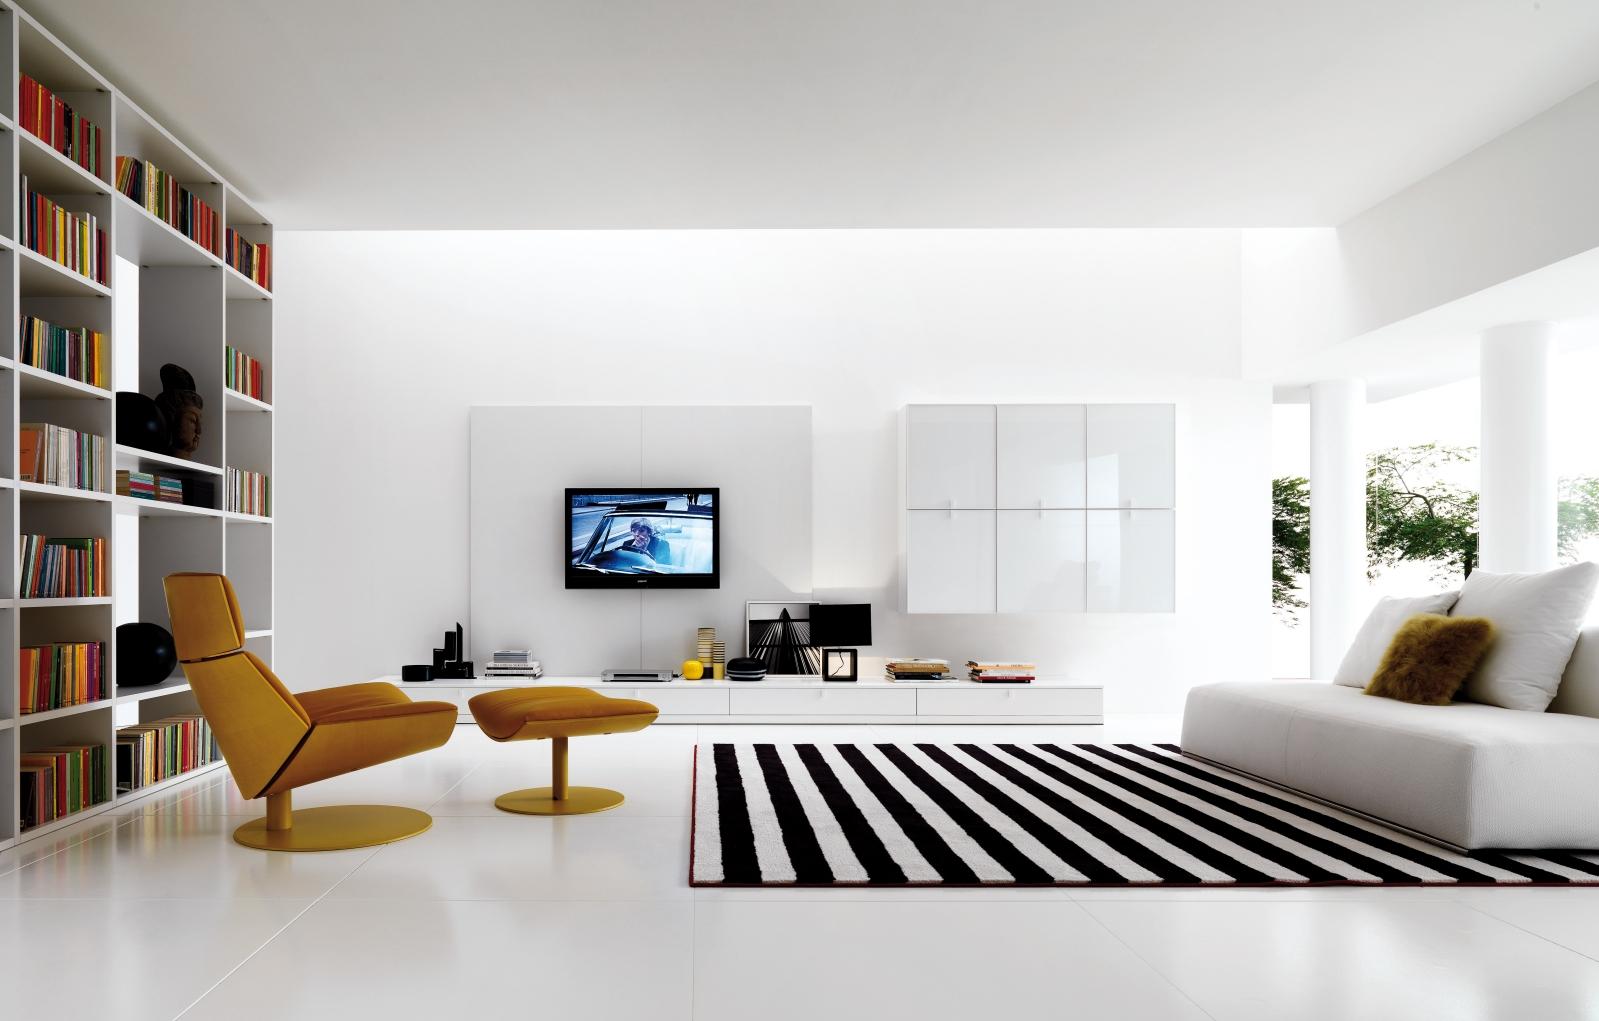 mlito 客厅电视墙装修设计